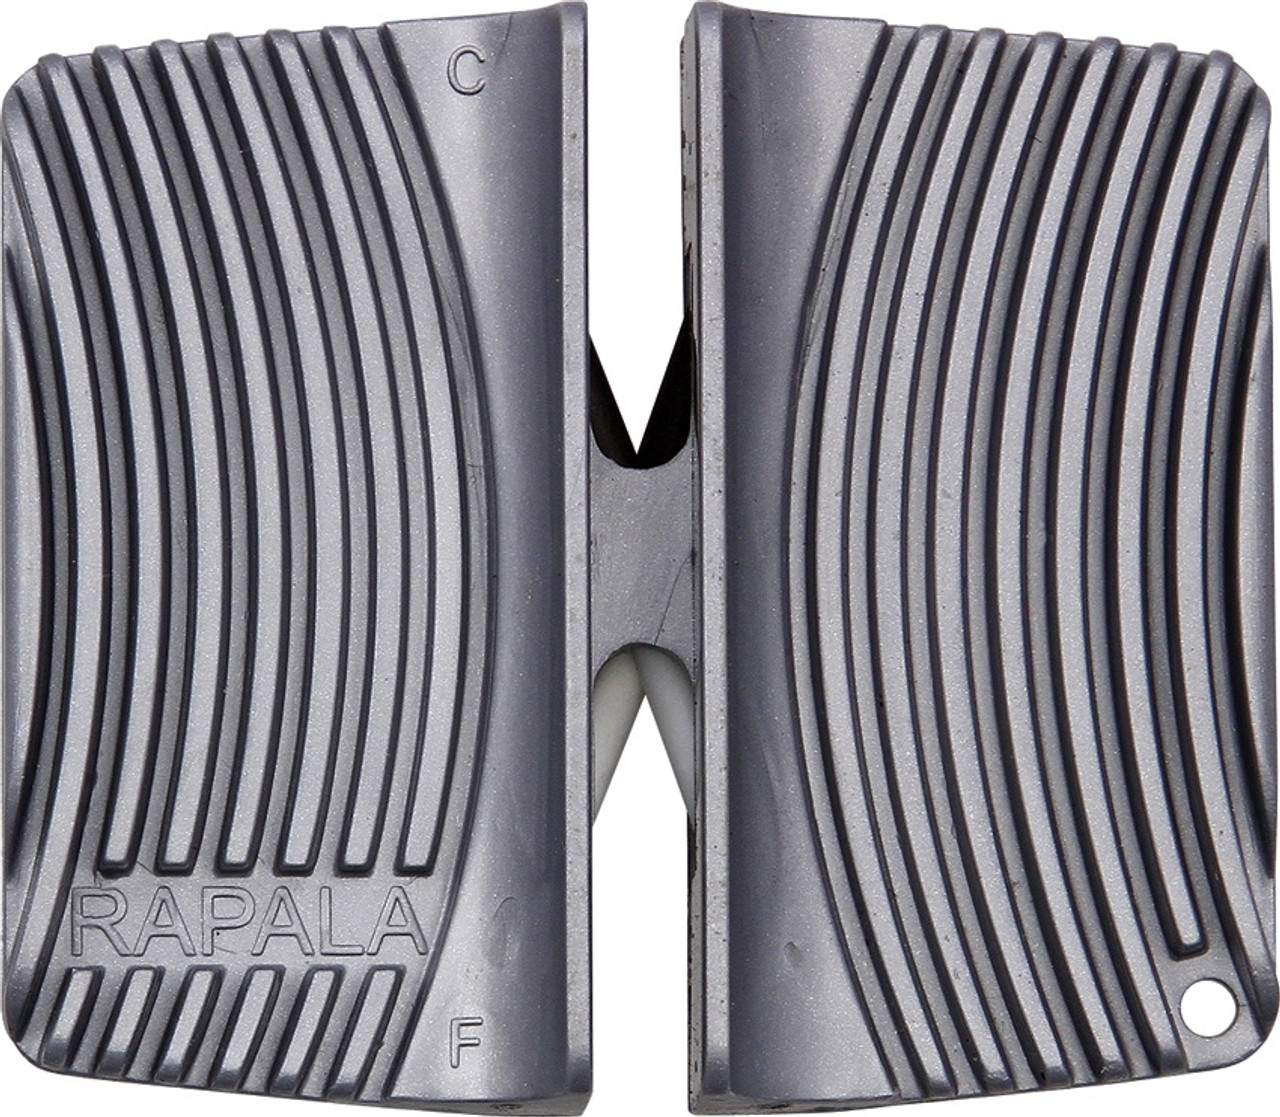 Rapala NK2 Two-Stage Ceramic Sharpener (Coarse & Fine)